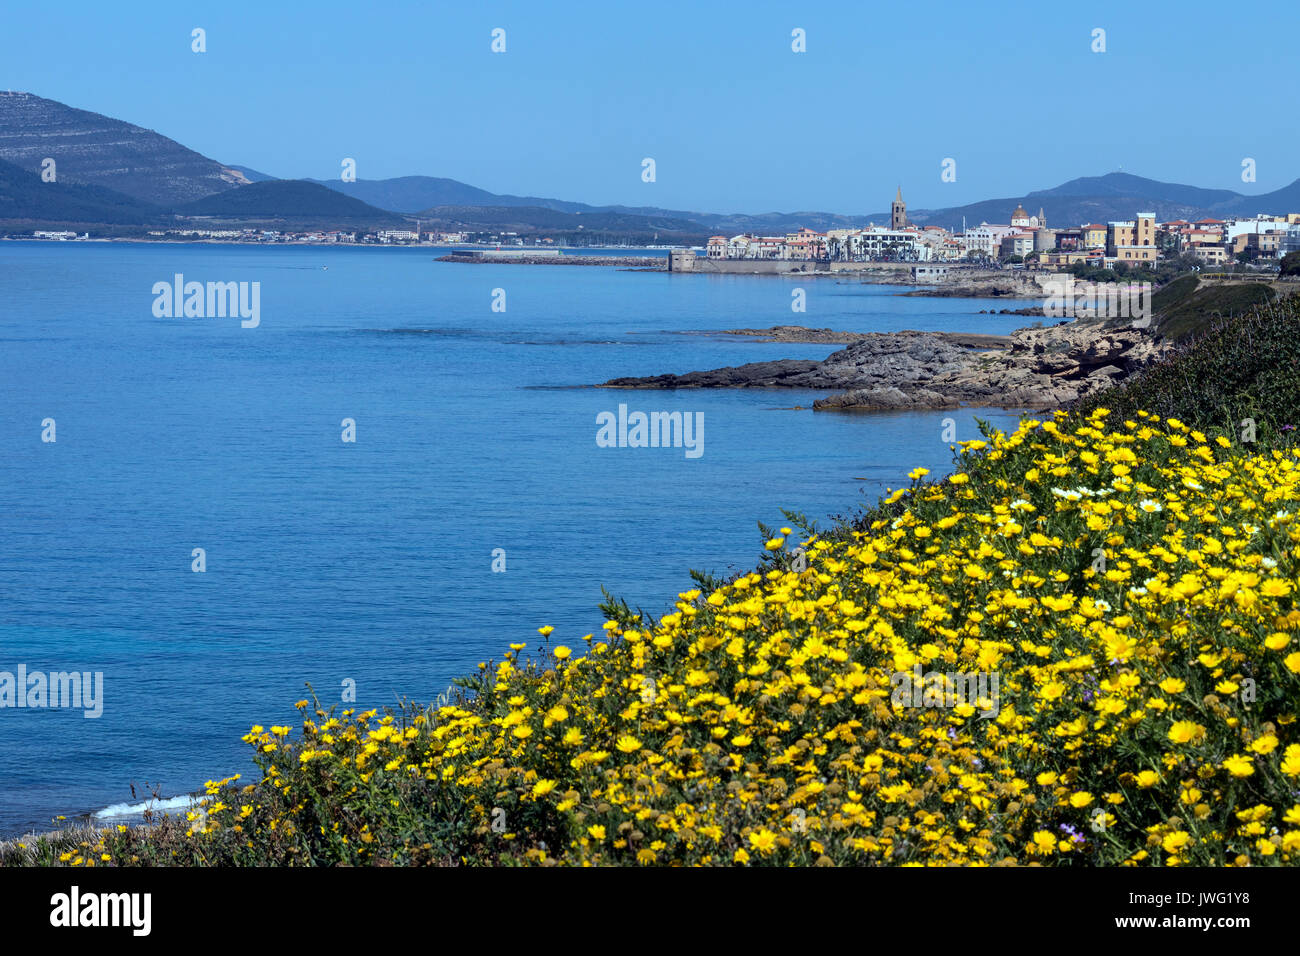 The coastline near the port of Alghero in the province of Sassari on the northwest coast of the island of Sardinia, Italy. - Stock Image